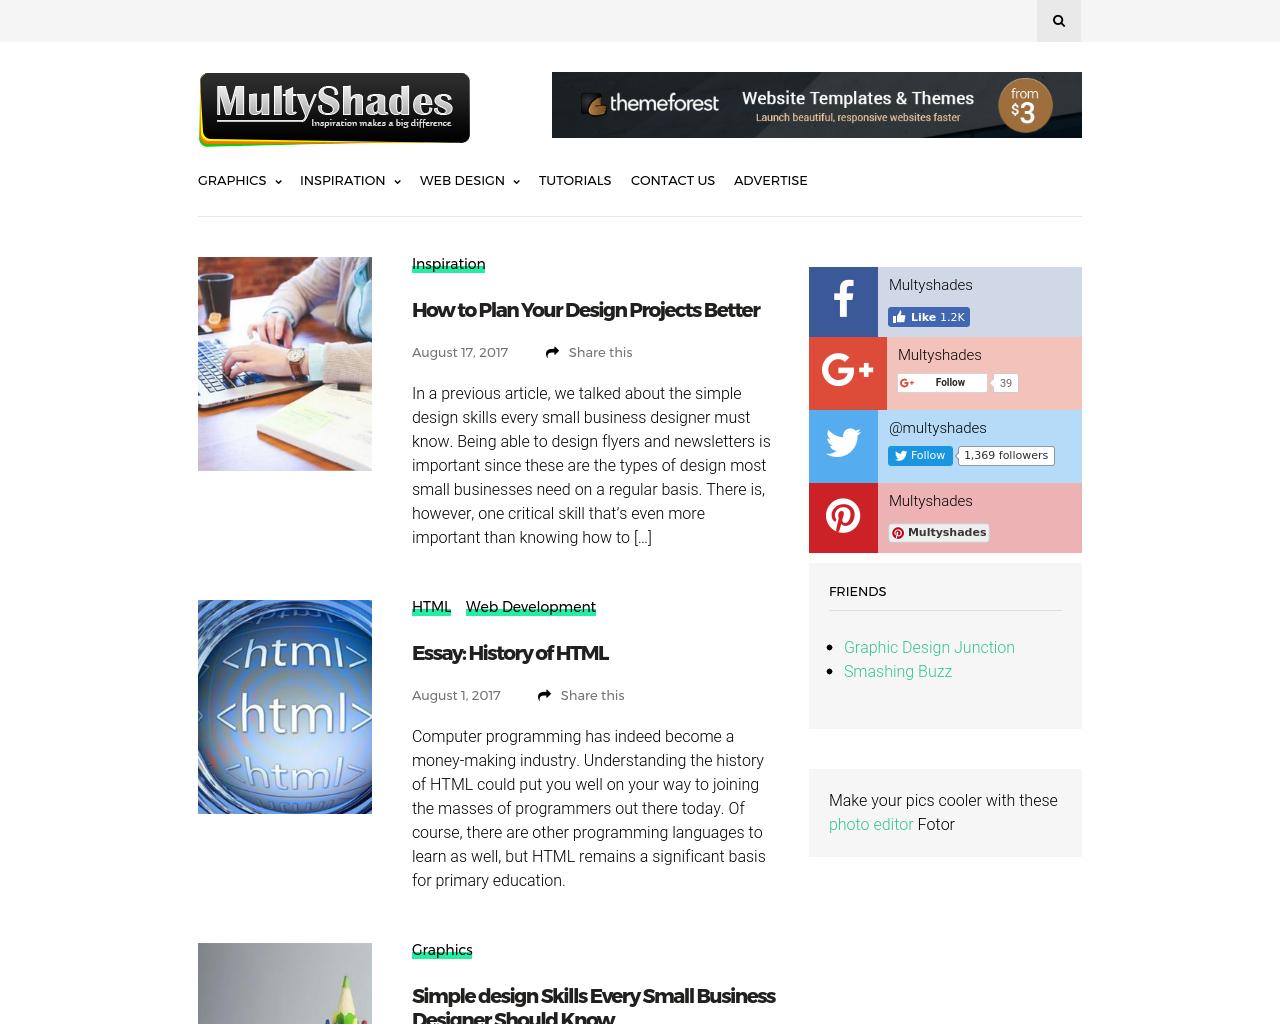 MultyShades-Advertising-Reviews-Pricing